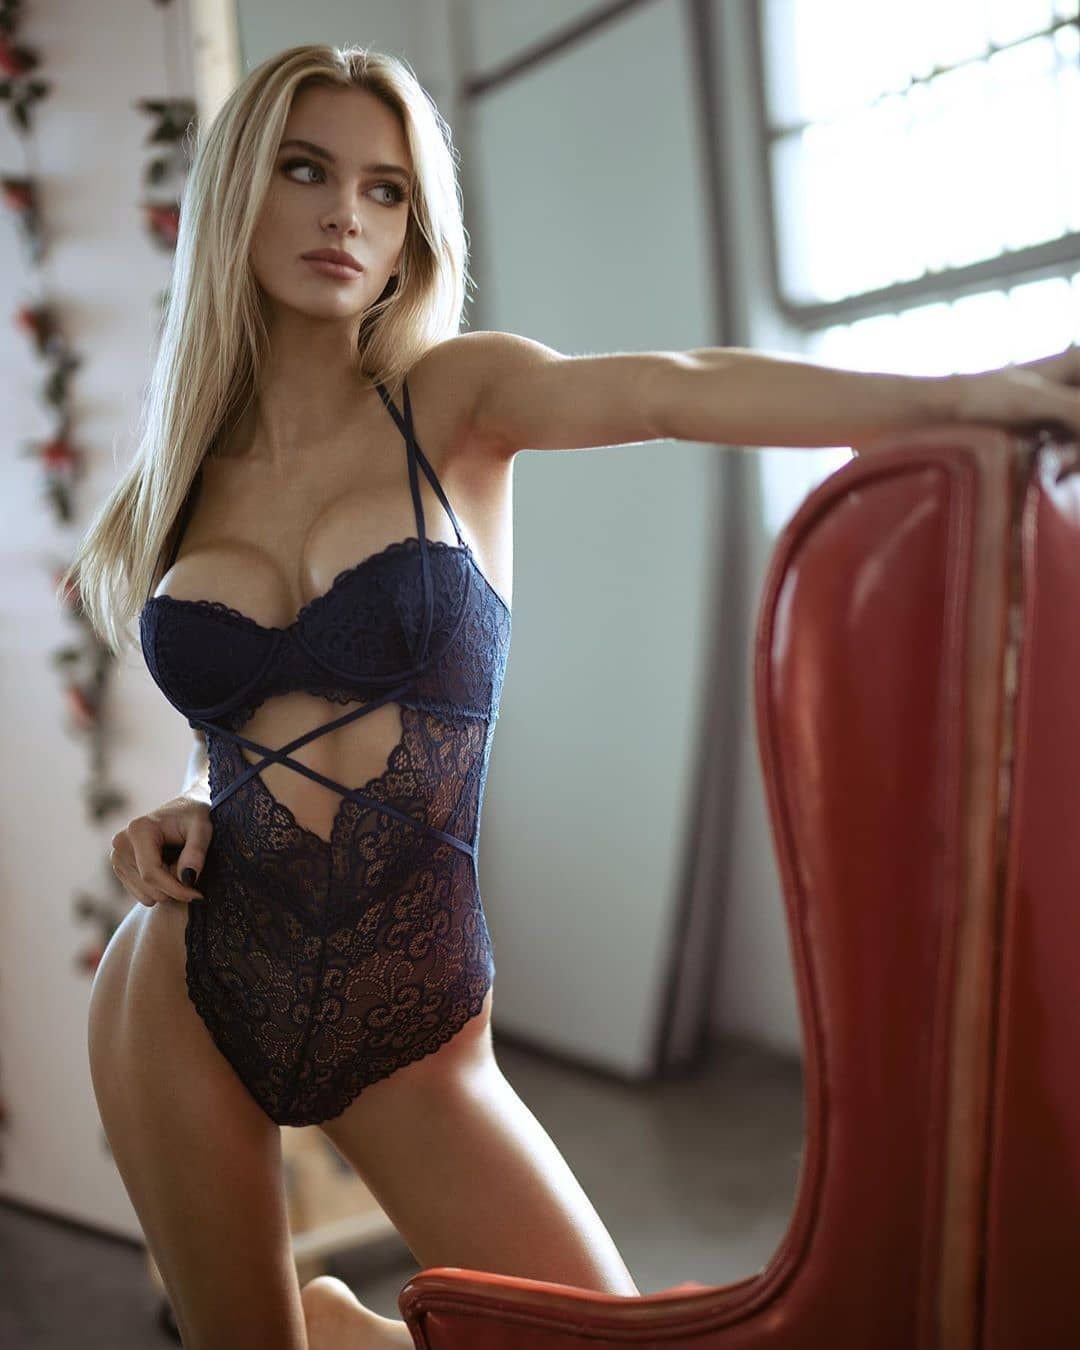 Emma Davies (@emroseedavies) | Fashion, Women, Instagram models